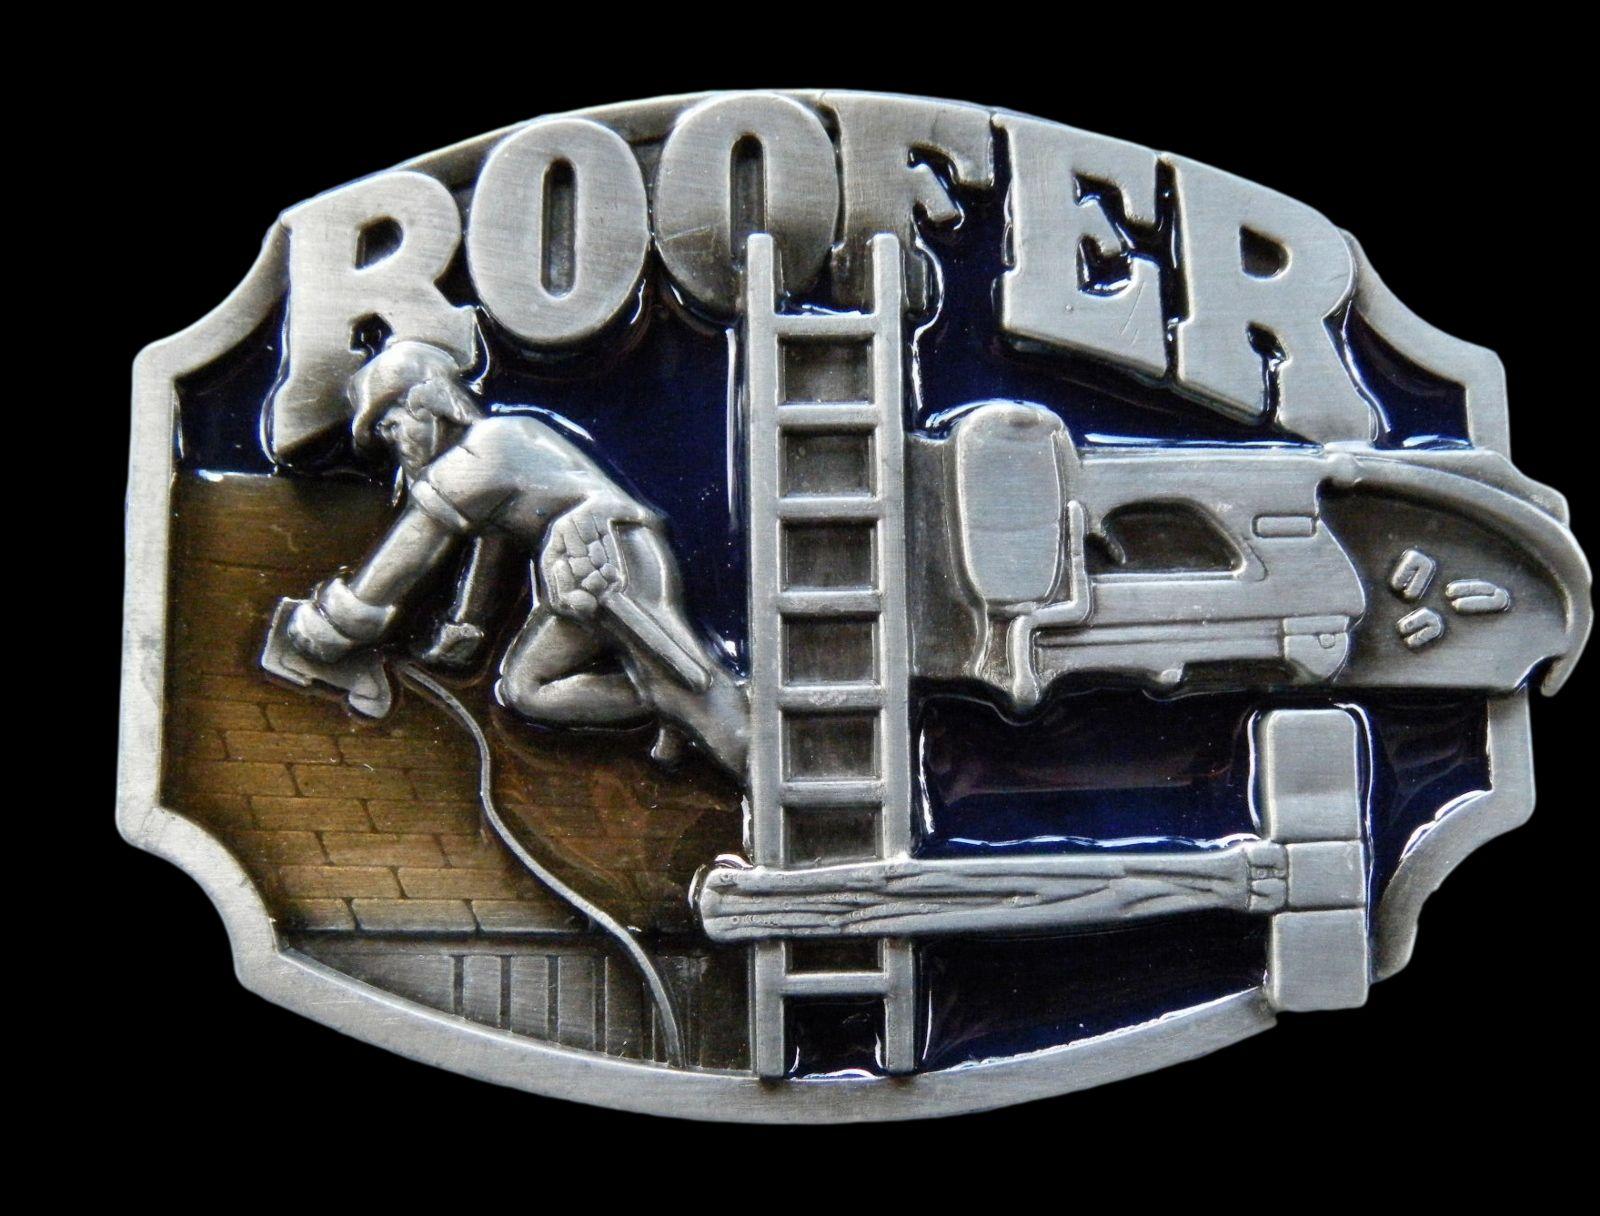 ROOFER CONSTRUCTION WORKERS TOOLS EQUIPMENT BELT BUCKLE